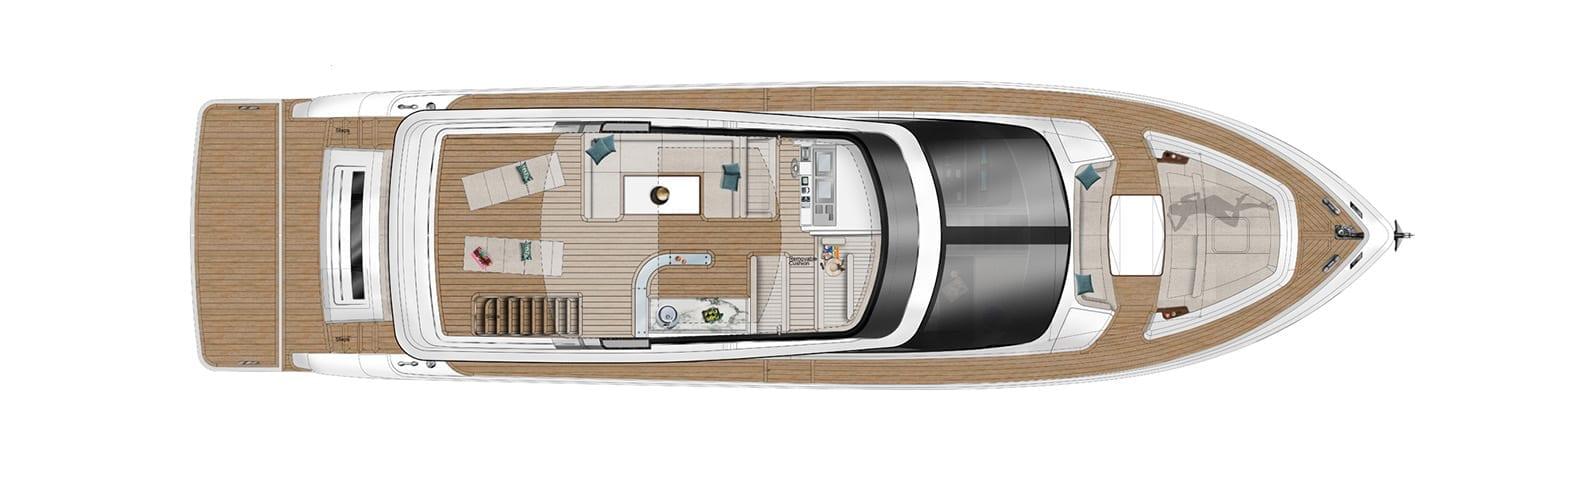 Uniesse-Capri-7-footprint-4